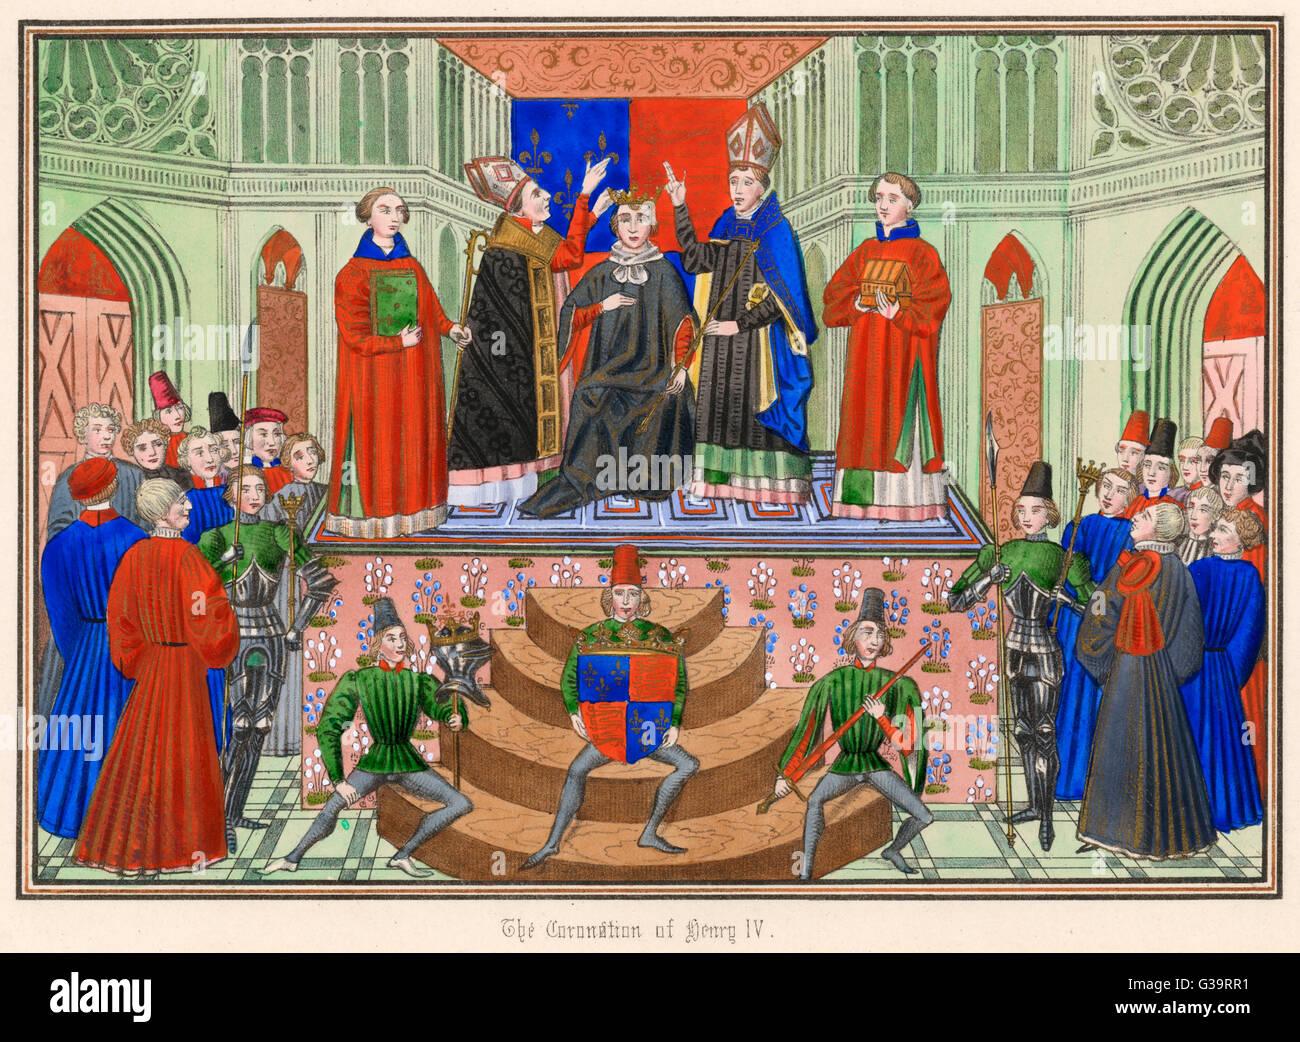 Enrique IV coronado en Westminster Fecha: 13 de octubre de 1399 Imagen De Stock